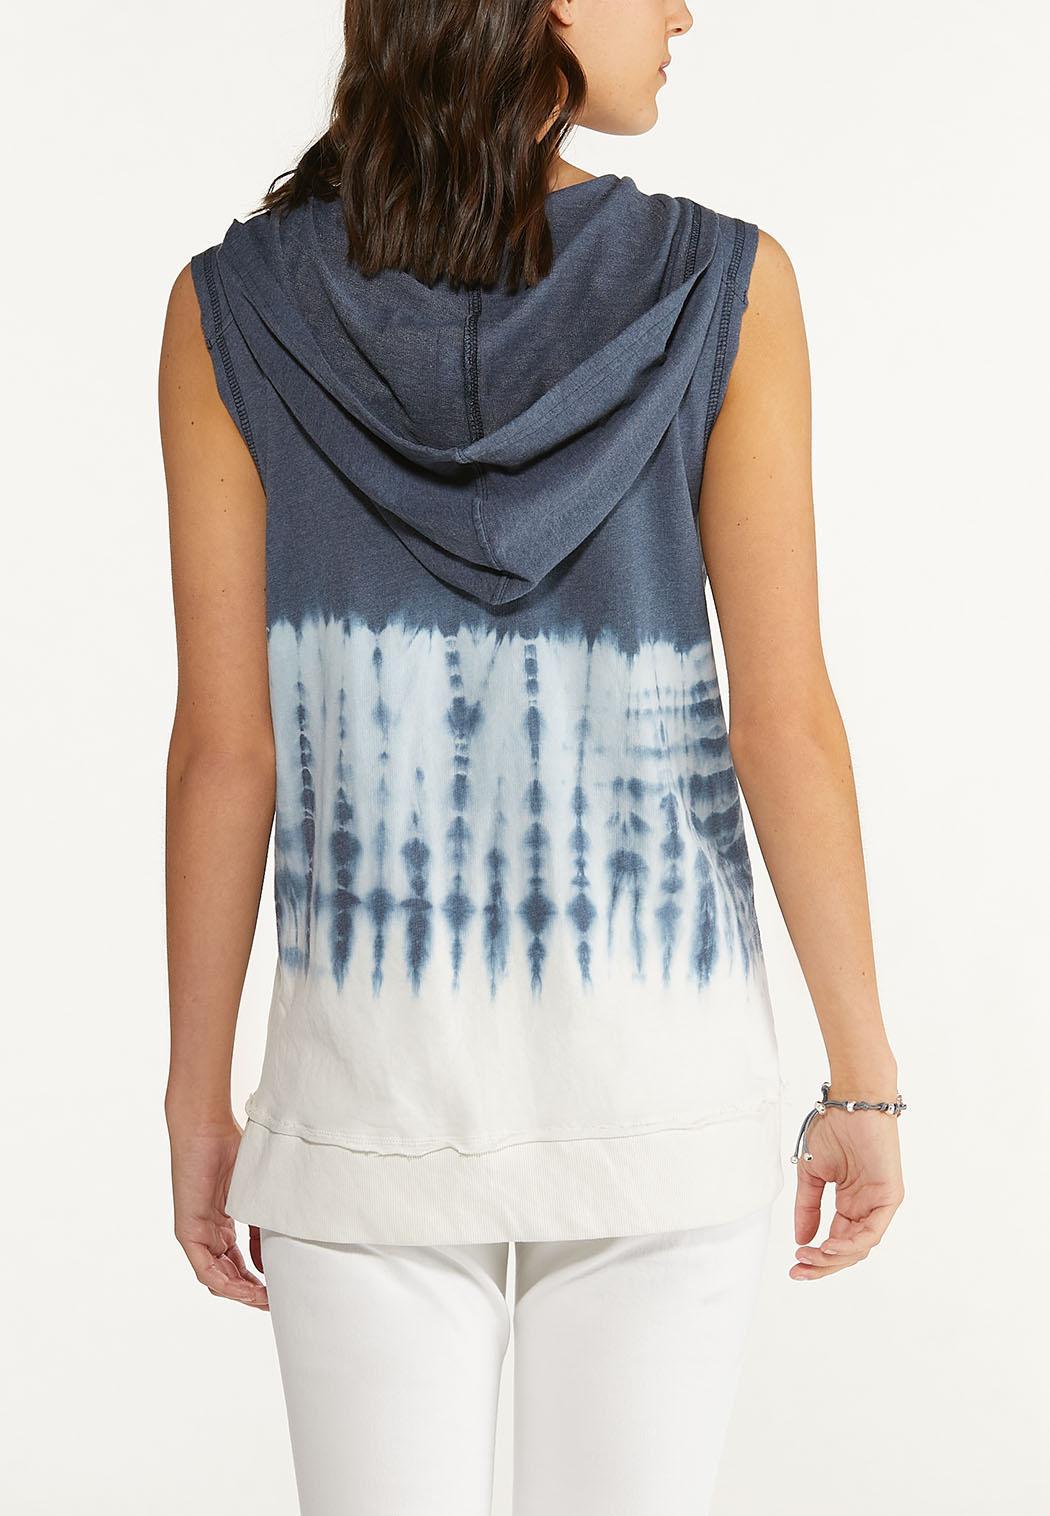 Plus Size Hooded Tank Sweatshirt (Item #44633886)